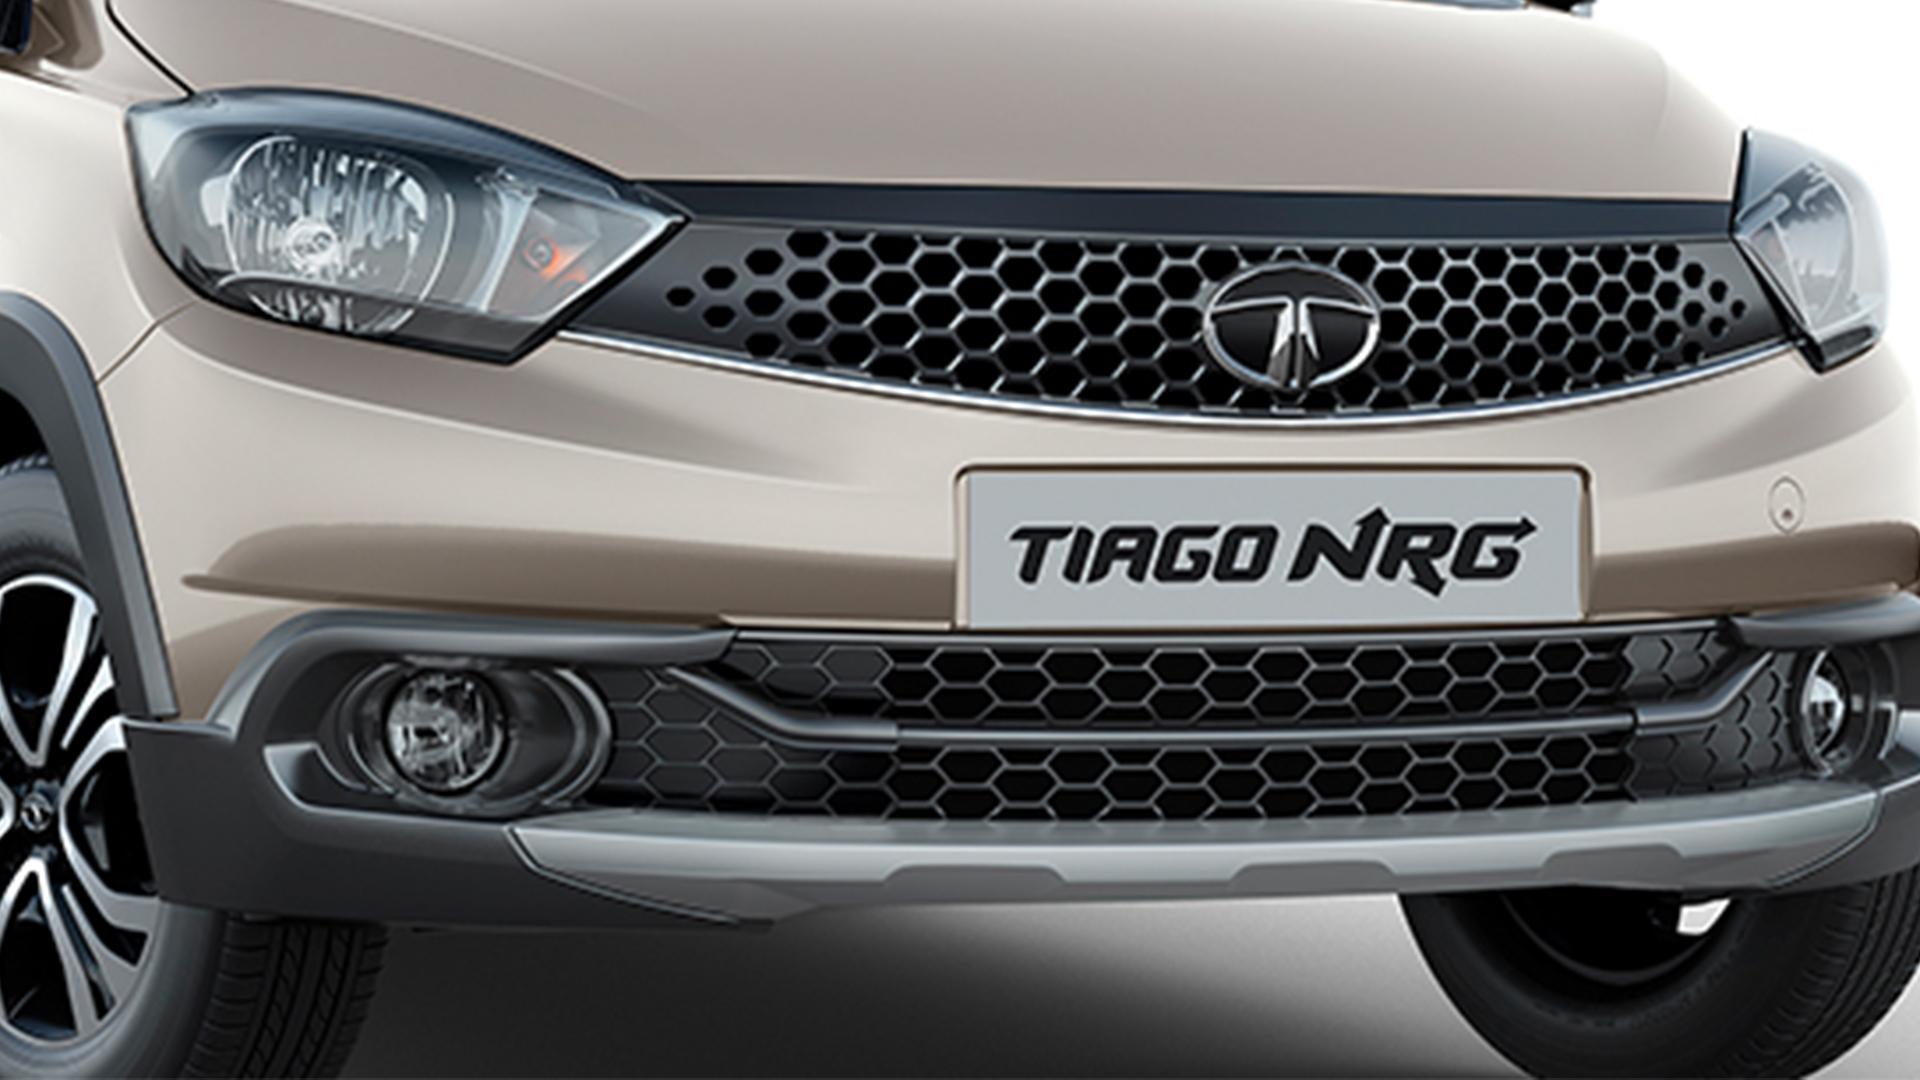 Tata Tiago NRG 2019 Revotron AMT Exterior